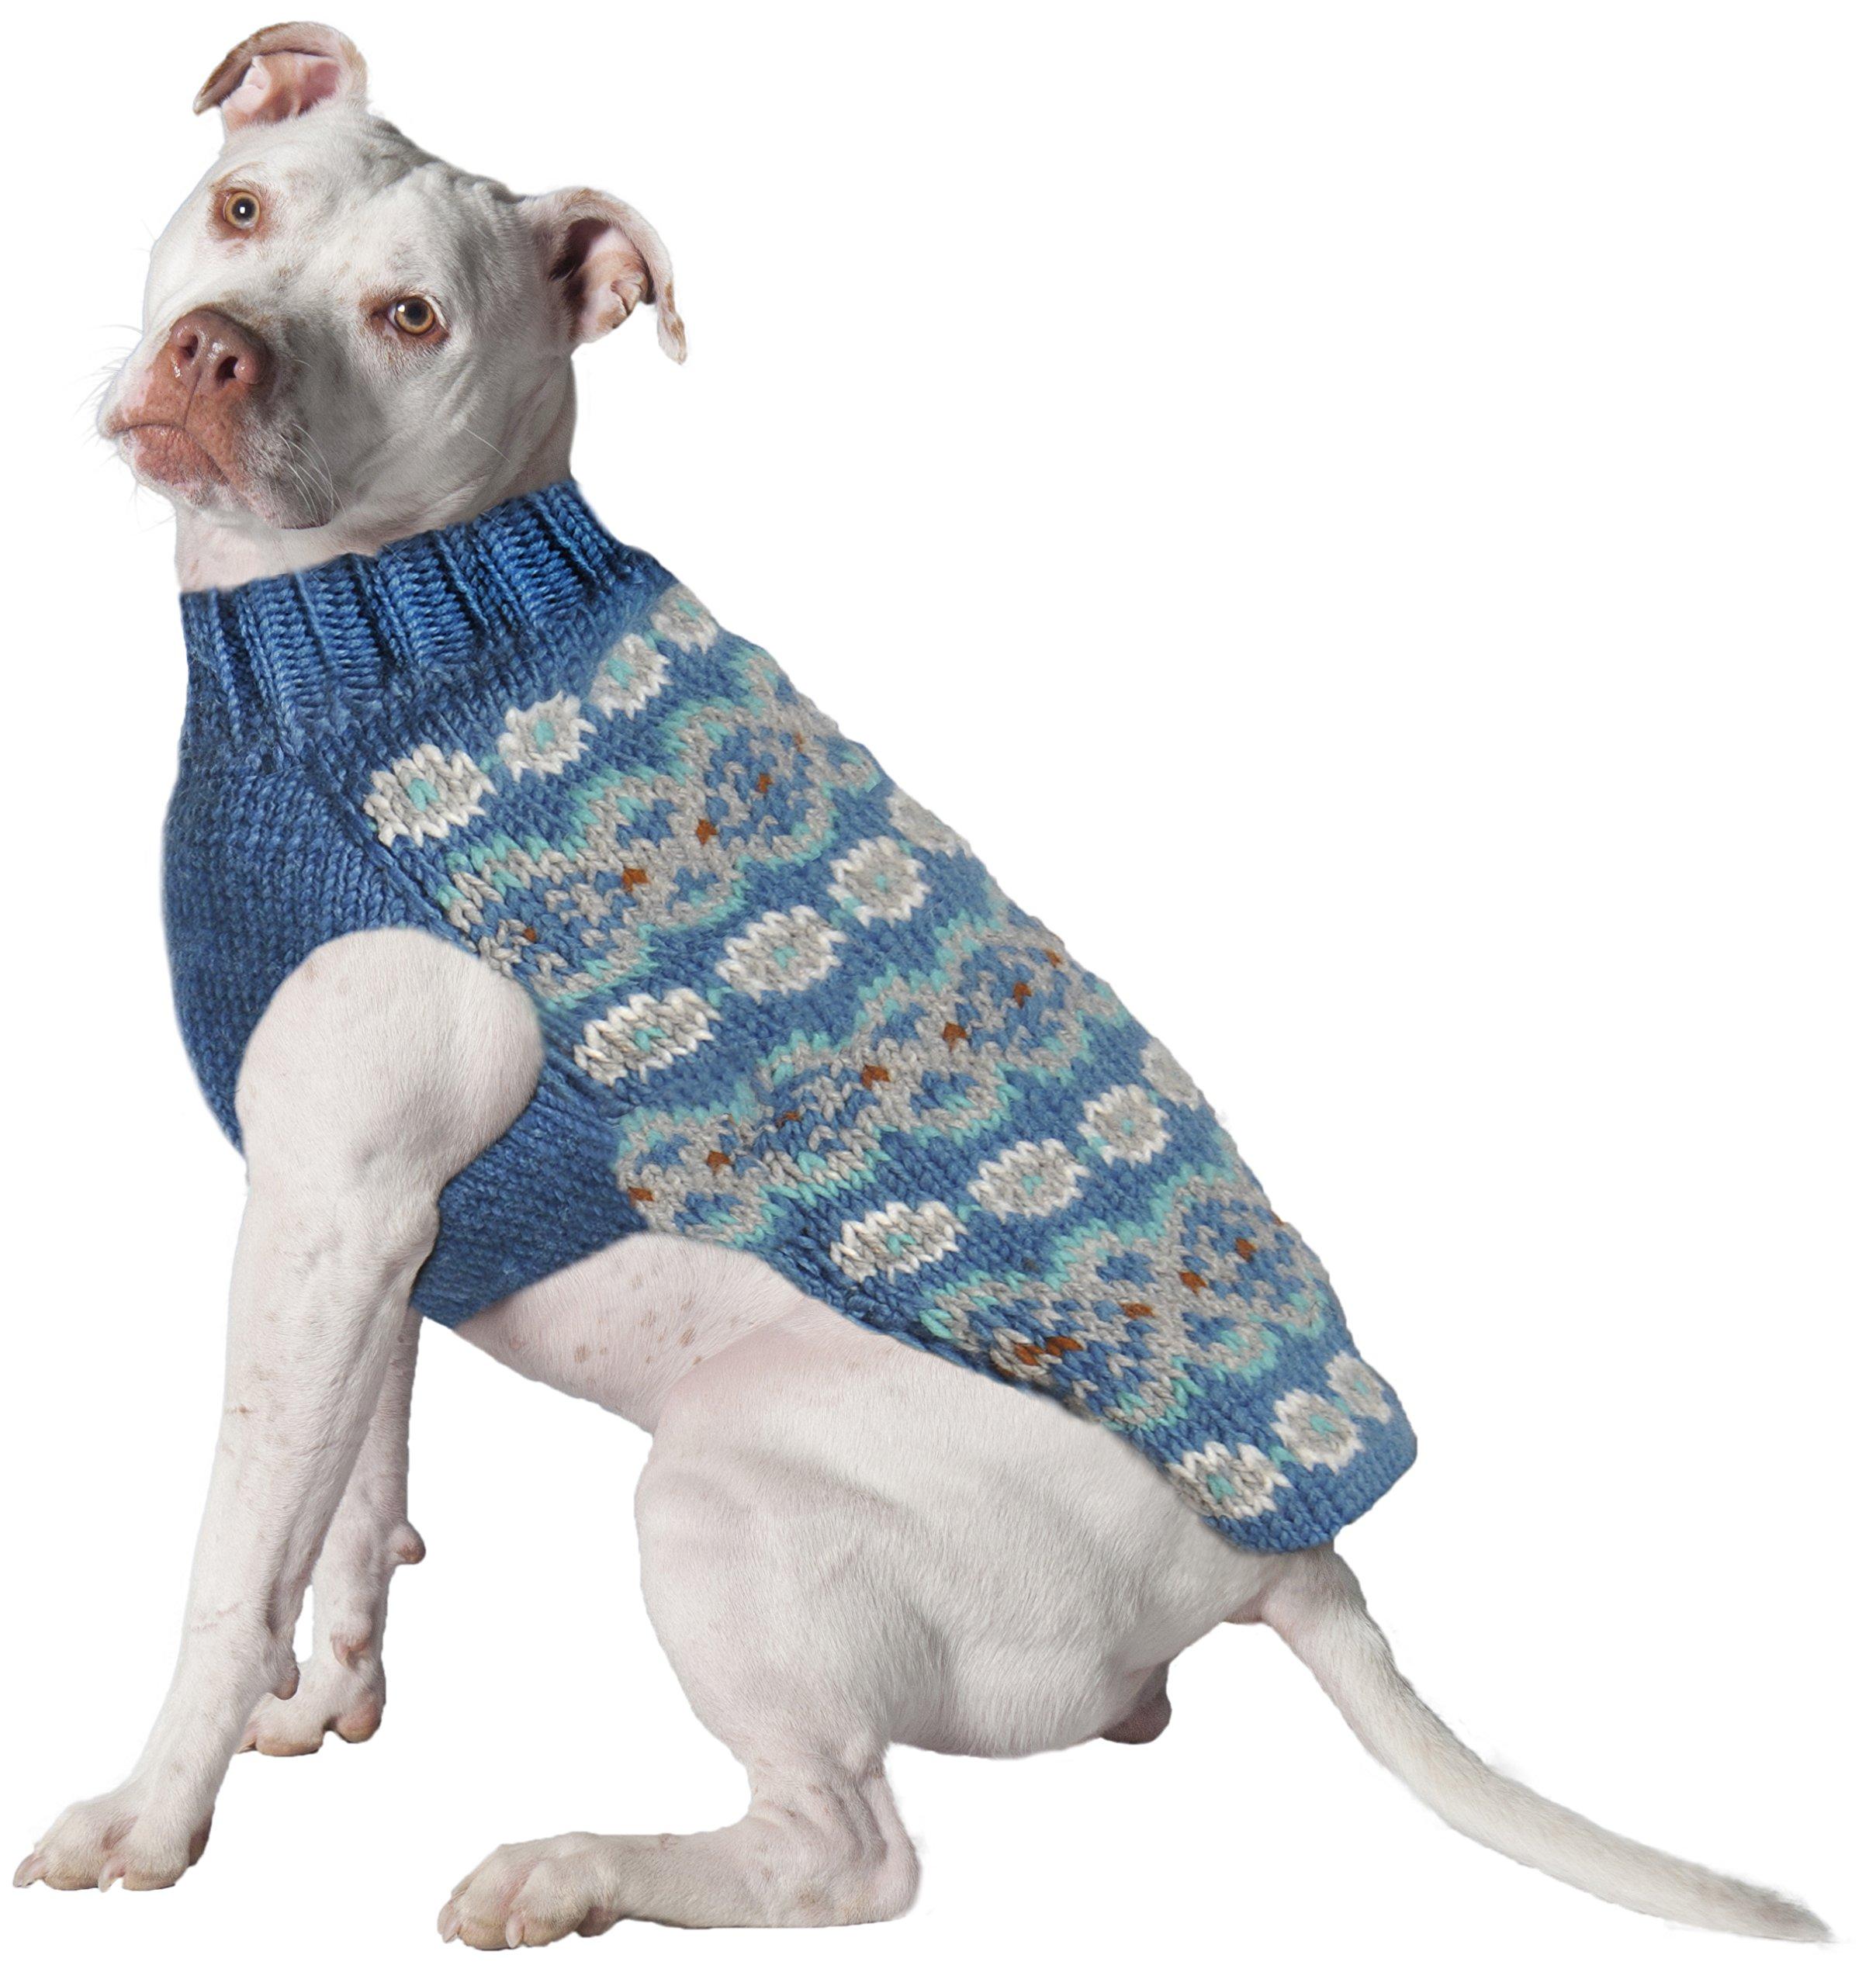 Chilly Dog Teal Fair Isle Alpaca Sweater, Small